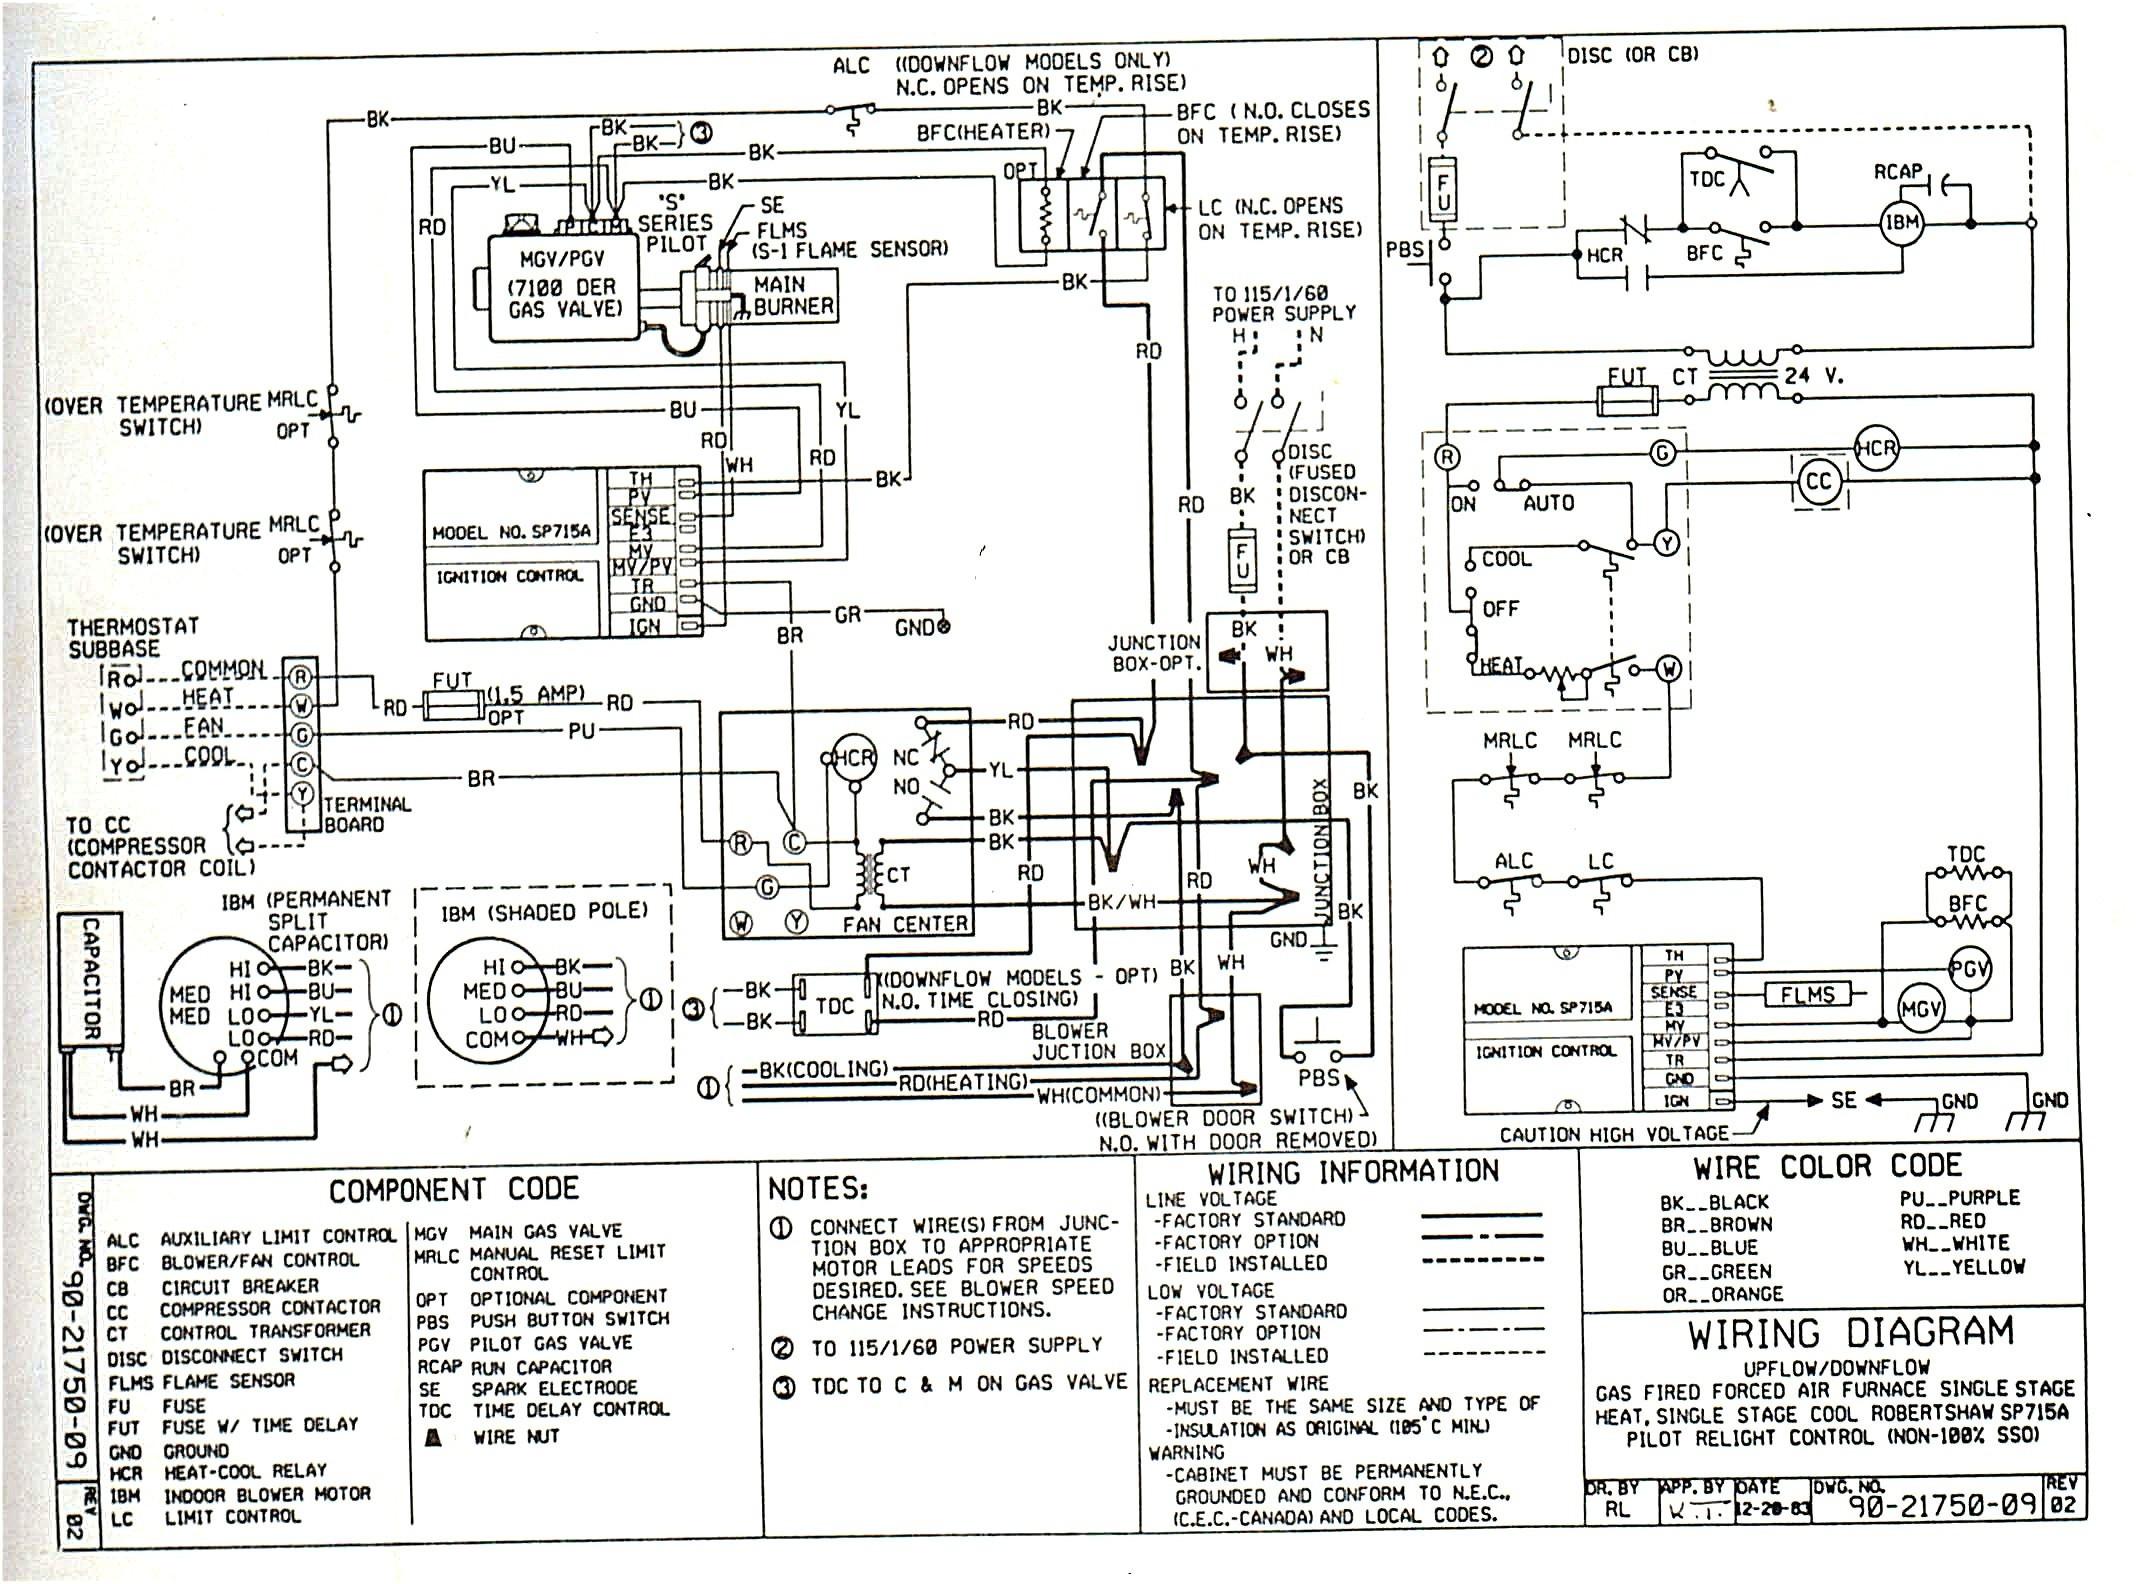 payne gas furnace gas valve wiring diagram